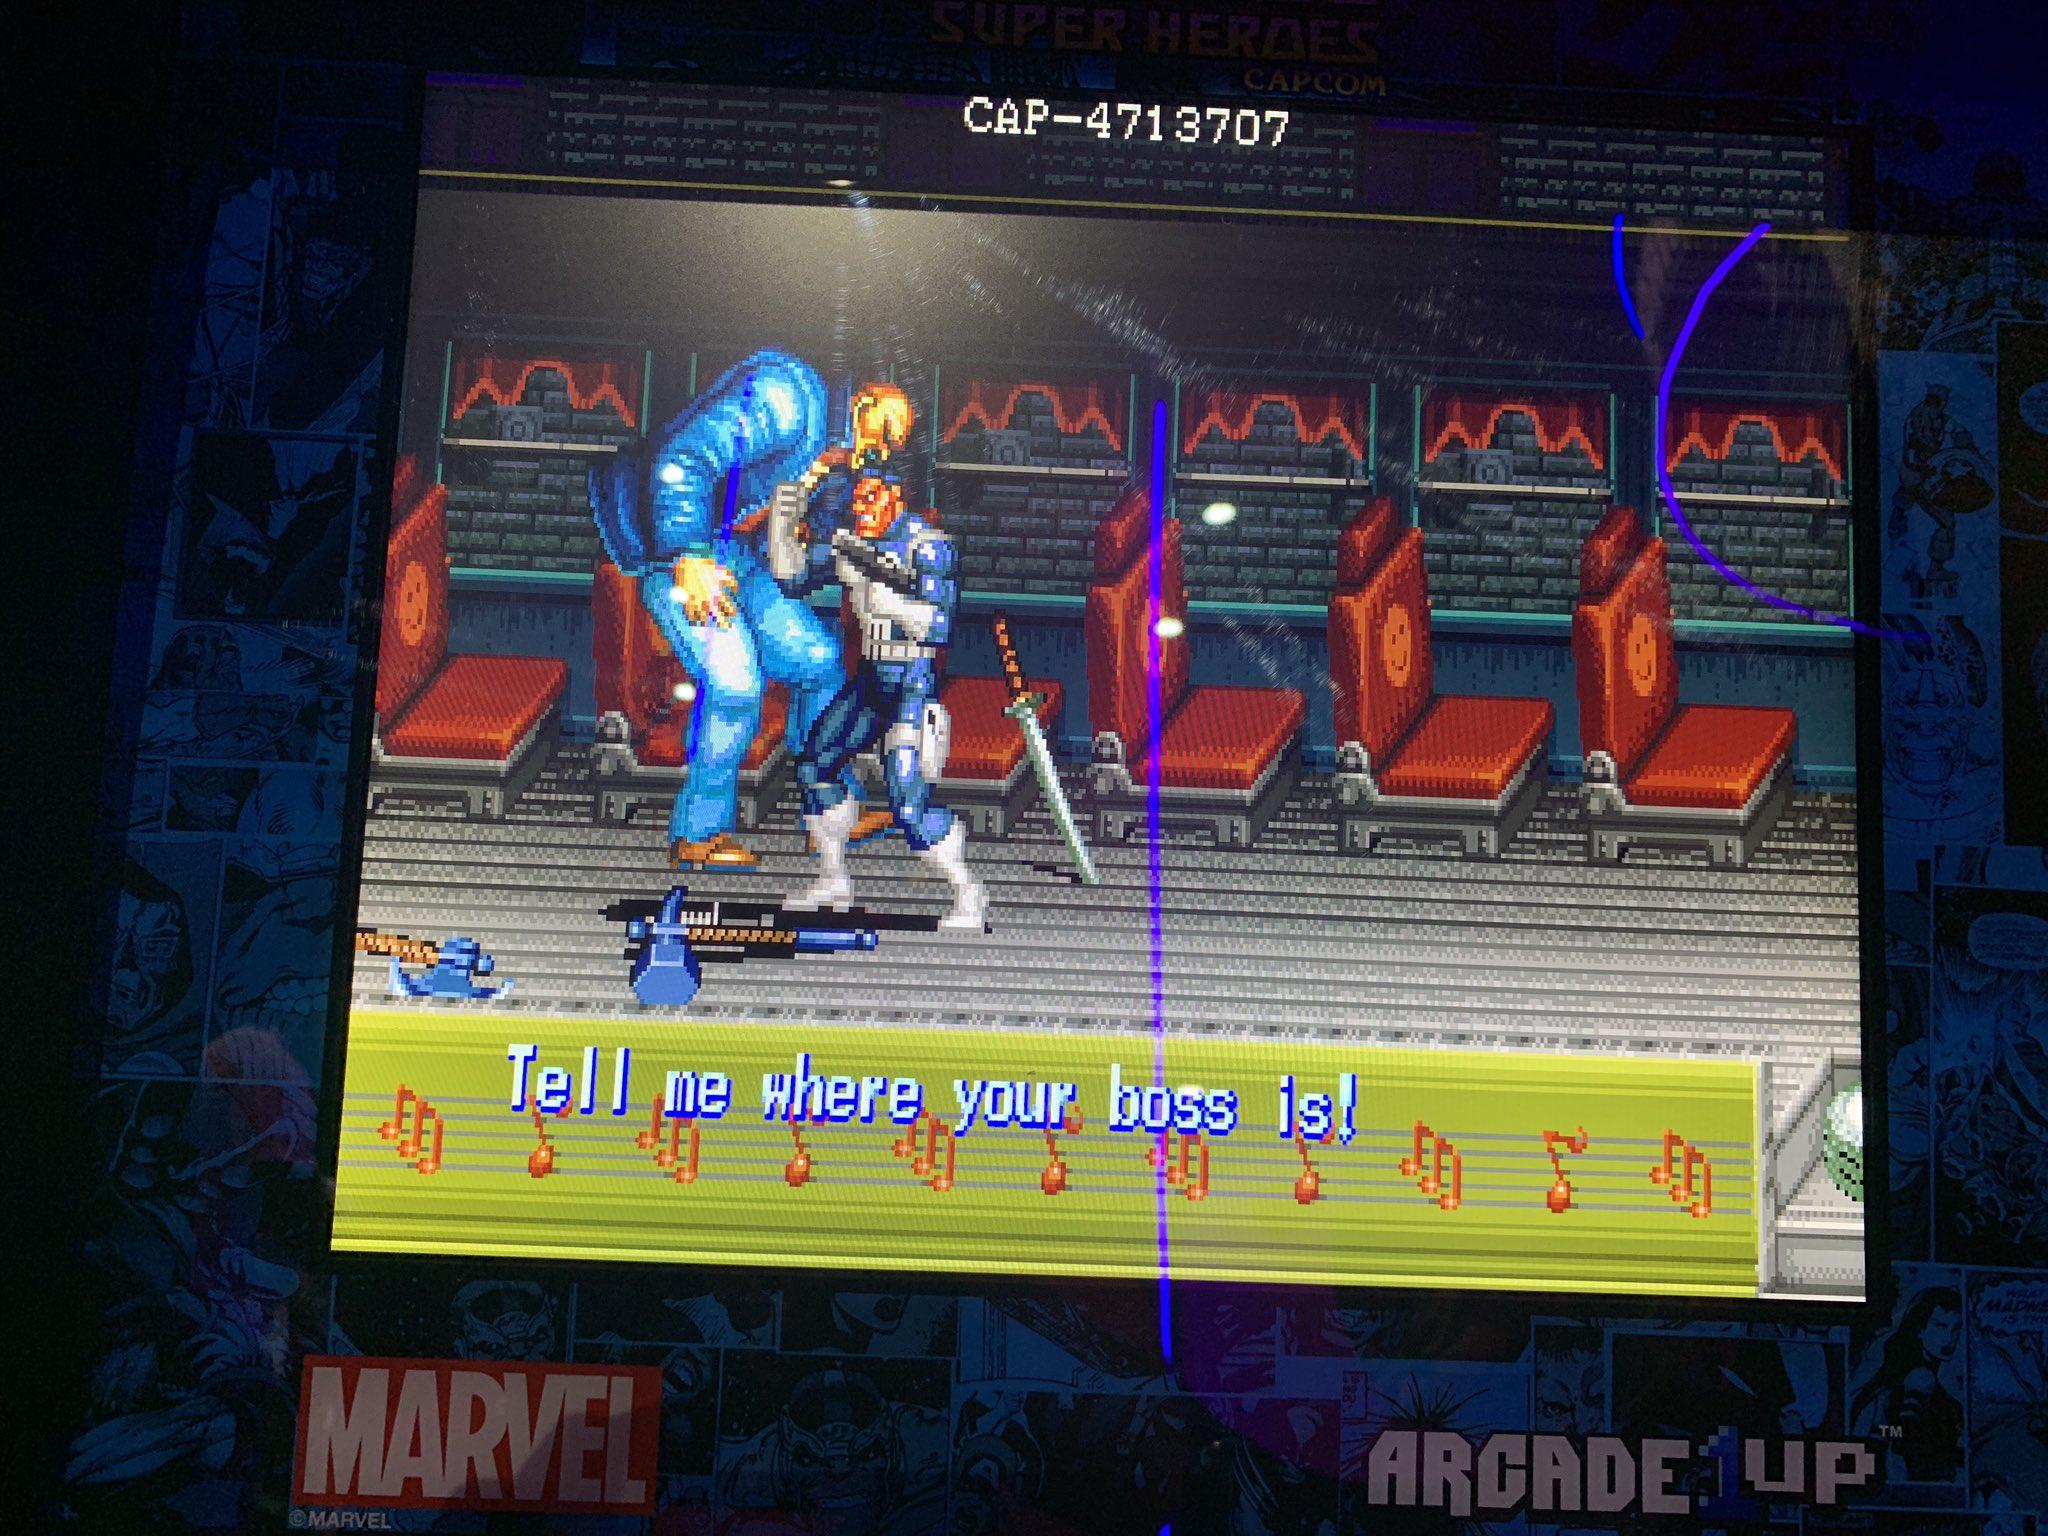 Marvel Arcade1up